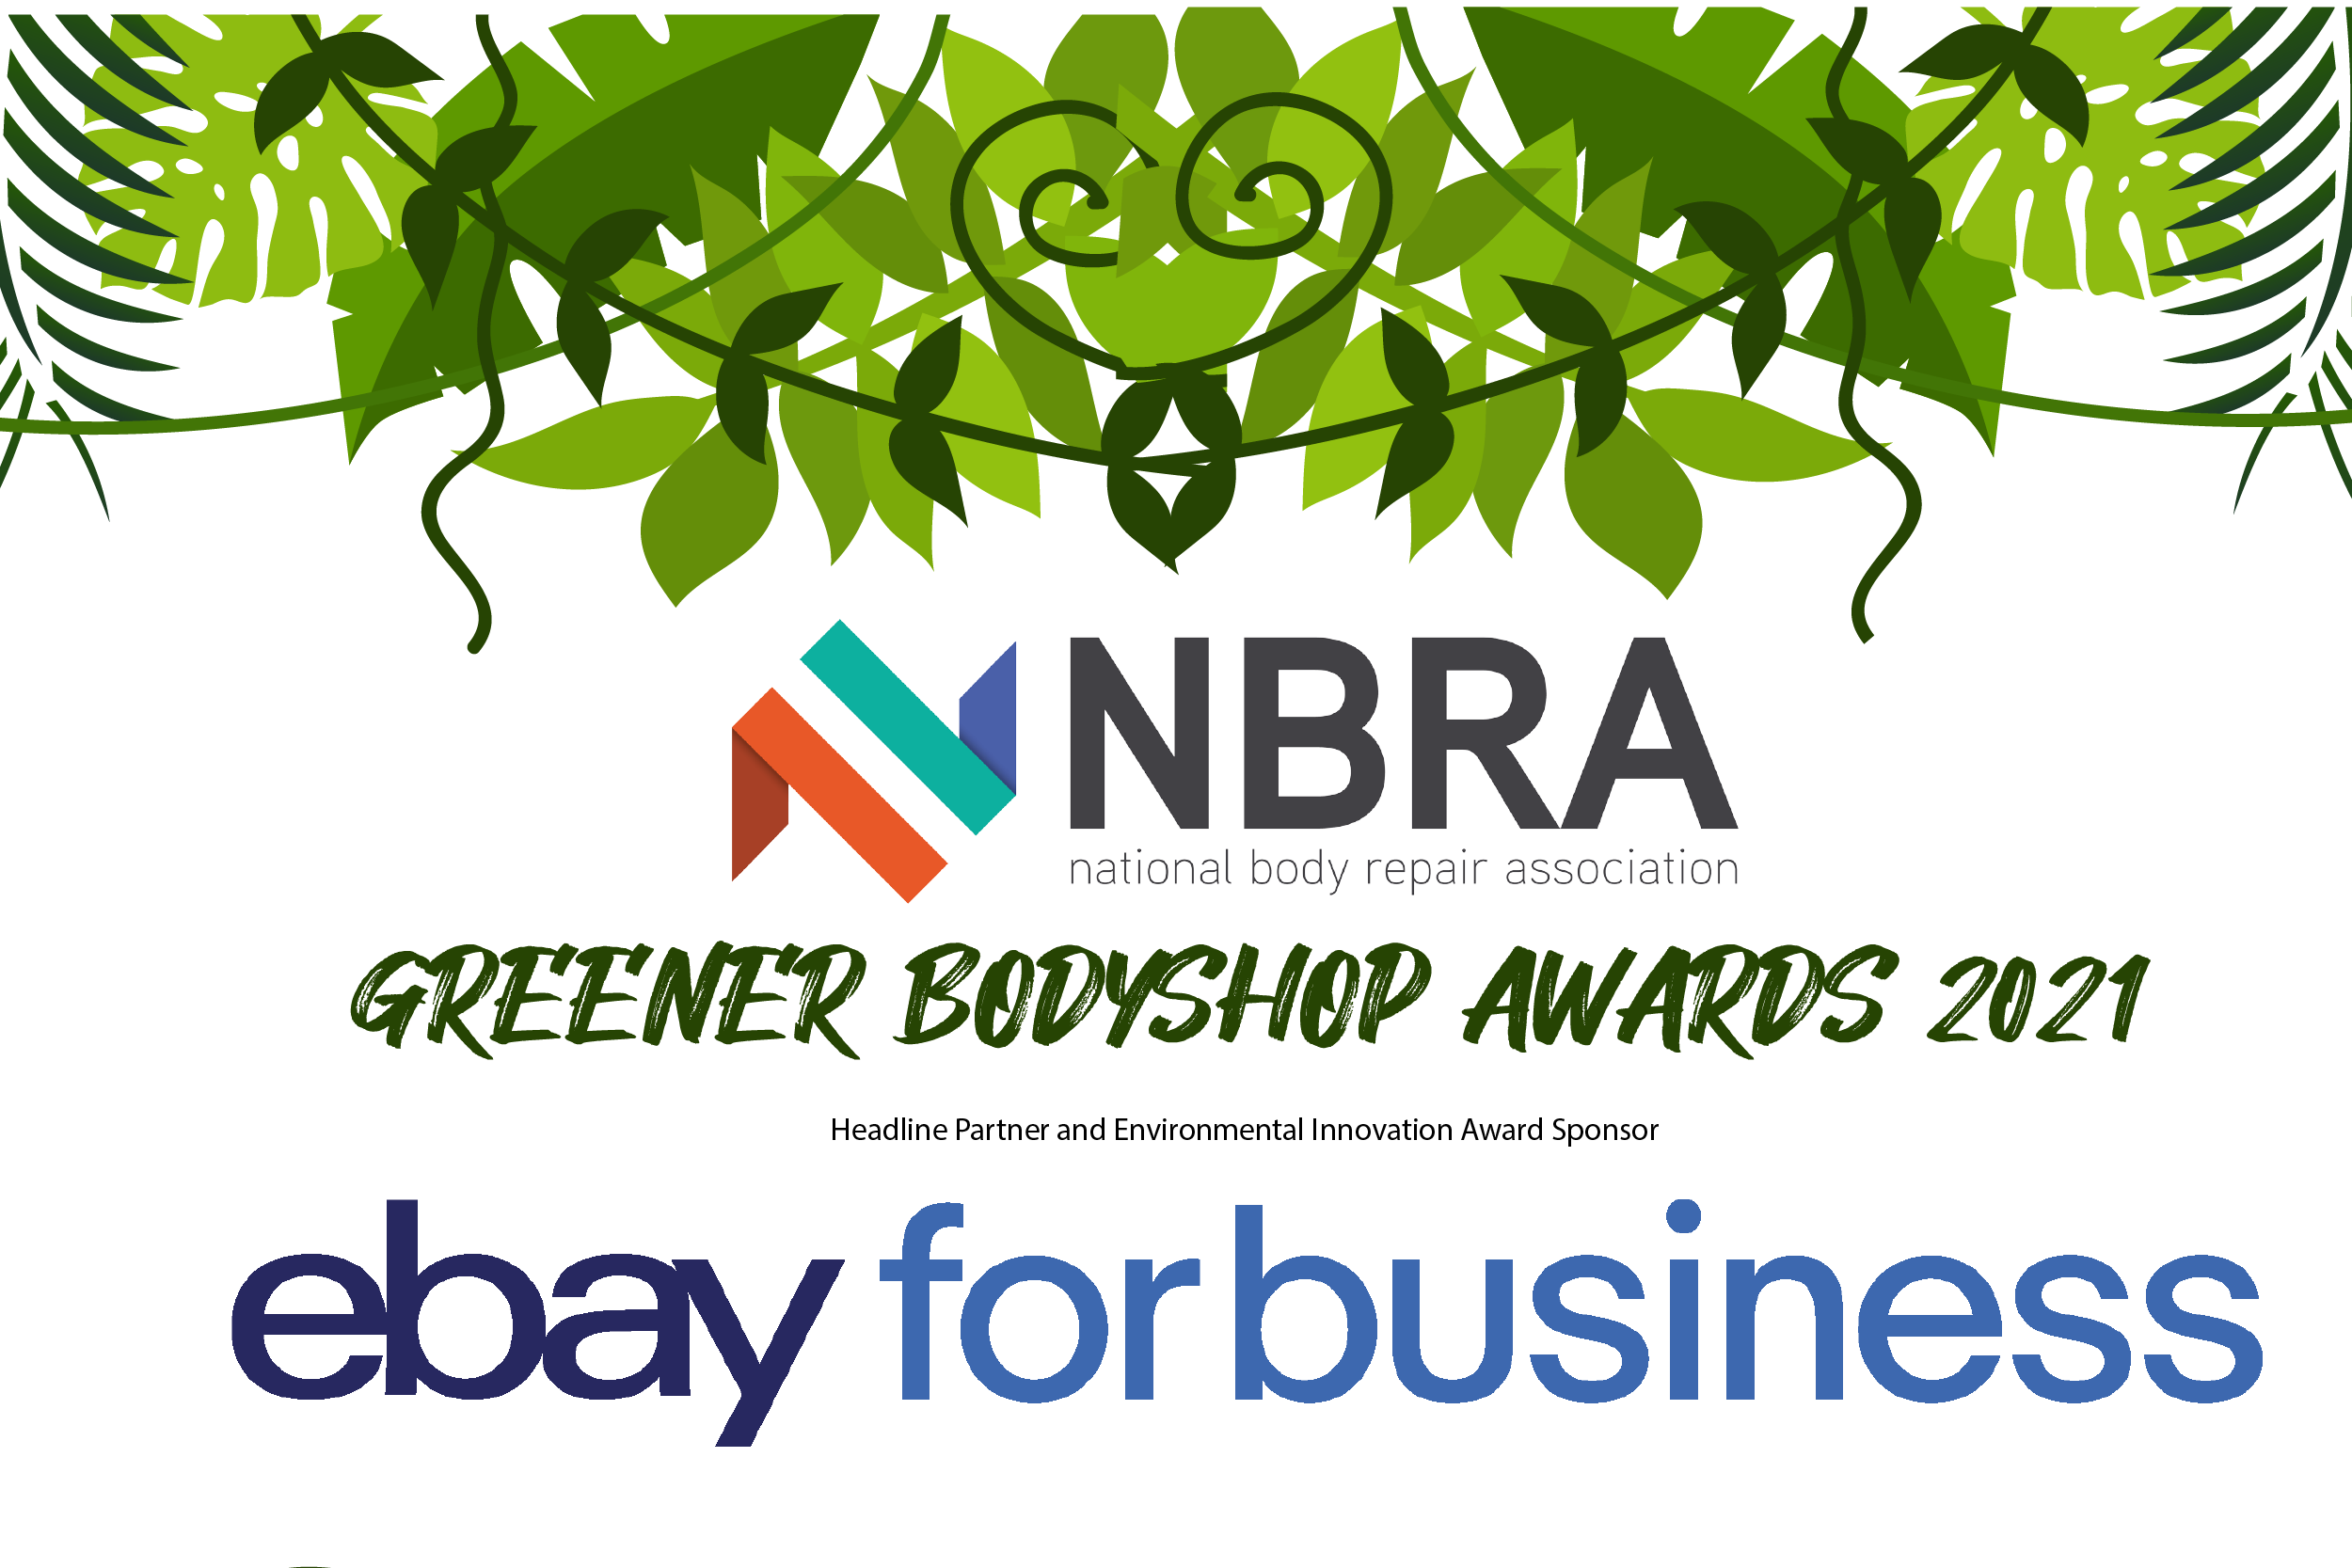 eBay announced as Greener Body Shop Award sponsor!